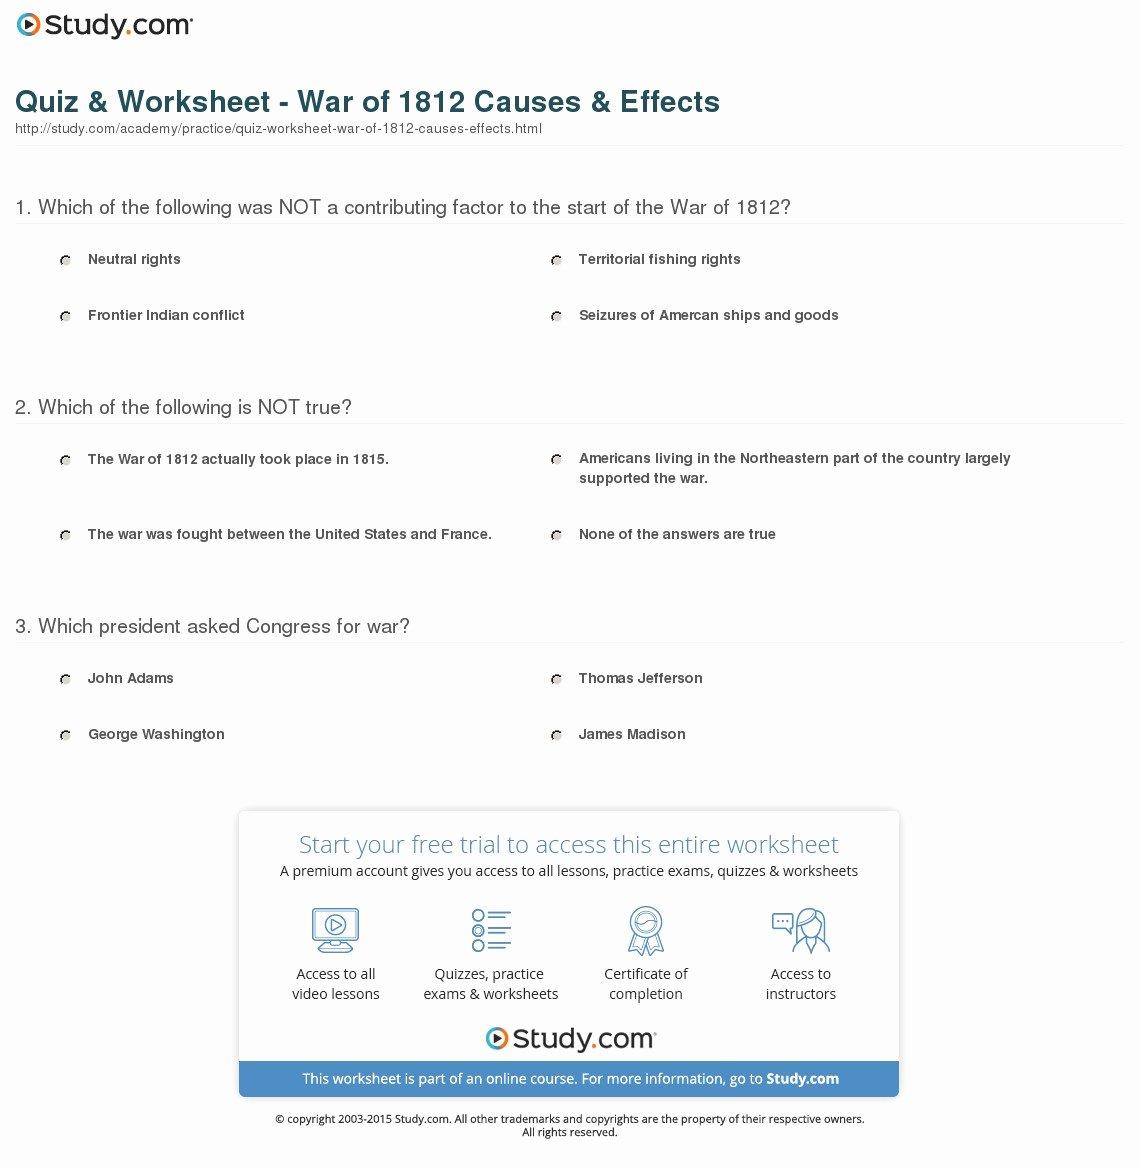 War Of 1812 Worksheet Luxury Quiz & Worksheet War Of 1812 Causes & Effects